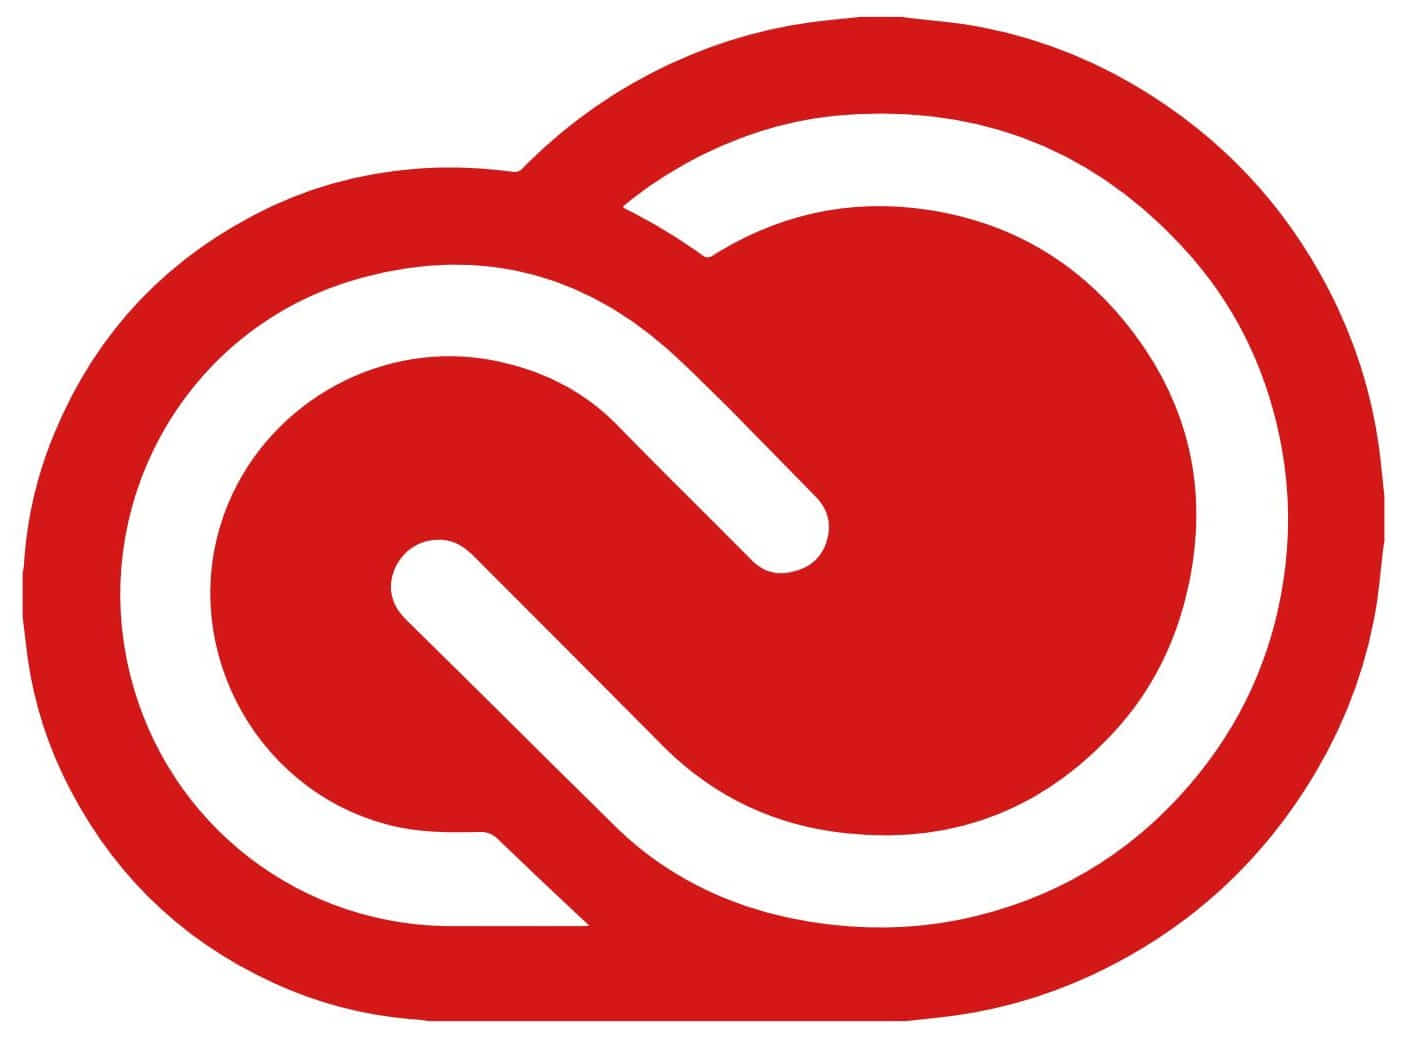 CC Logo [Adobe Creative Cloud].